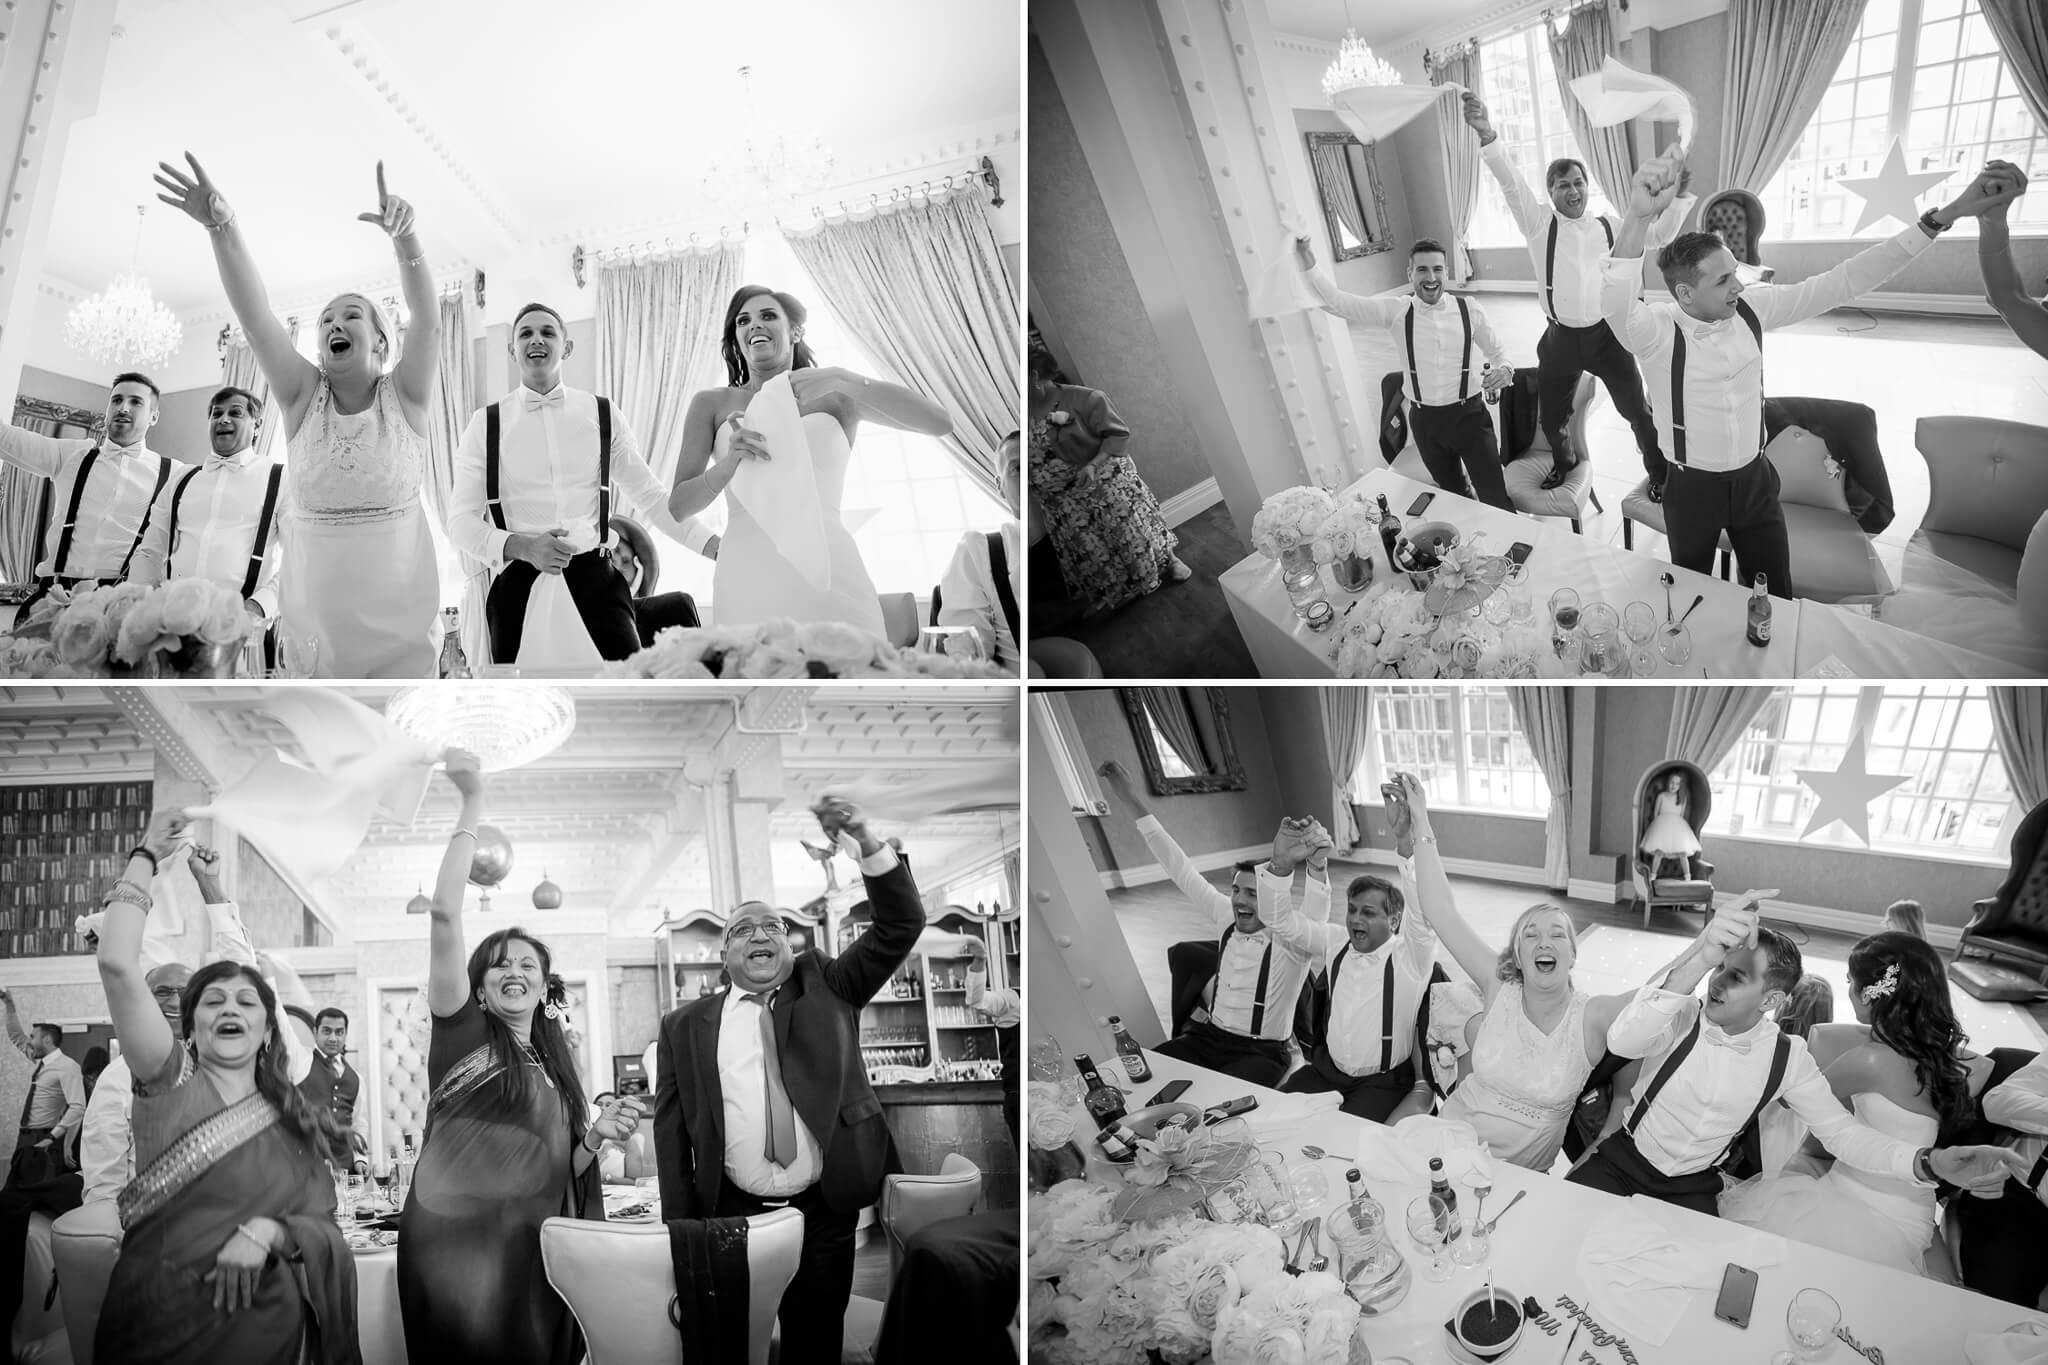 liverpool-wedding-photography-speeches-secret-waiters